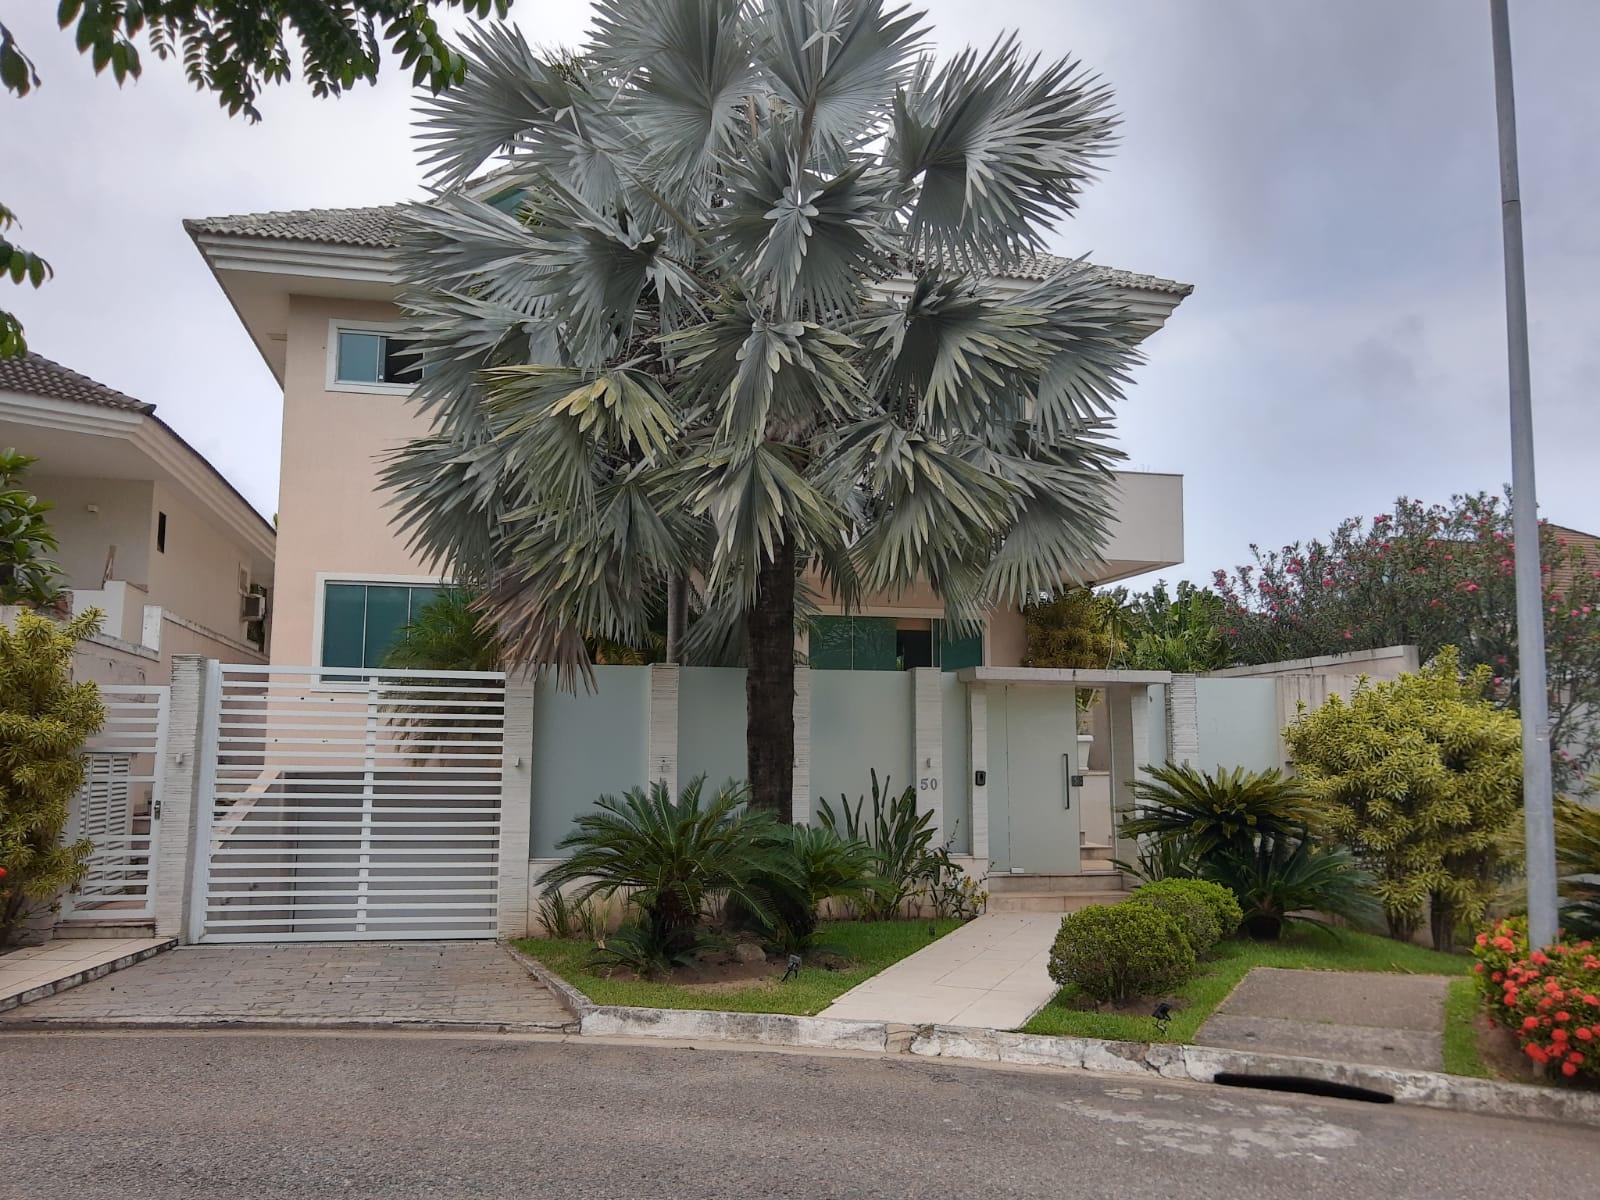 Casa no Cond Quintas do Rio-Barra - 38vt - Proc 0010387-54.2013